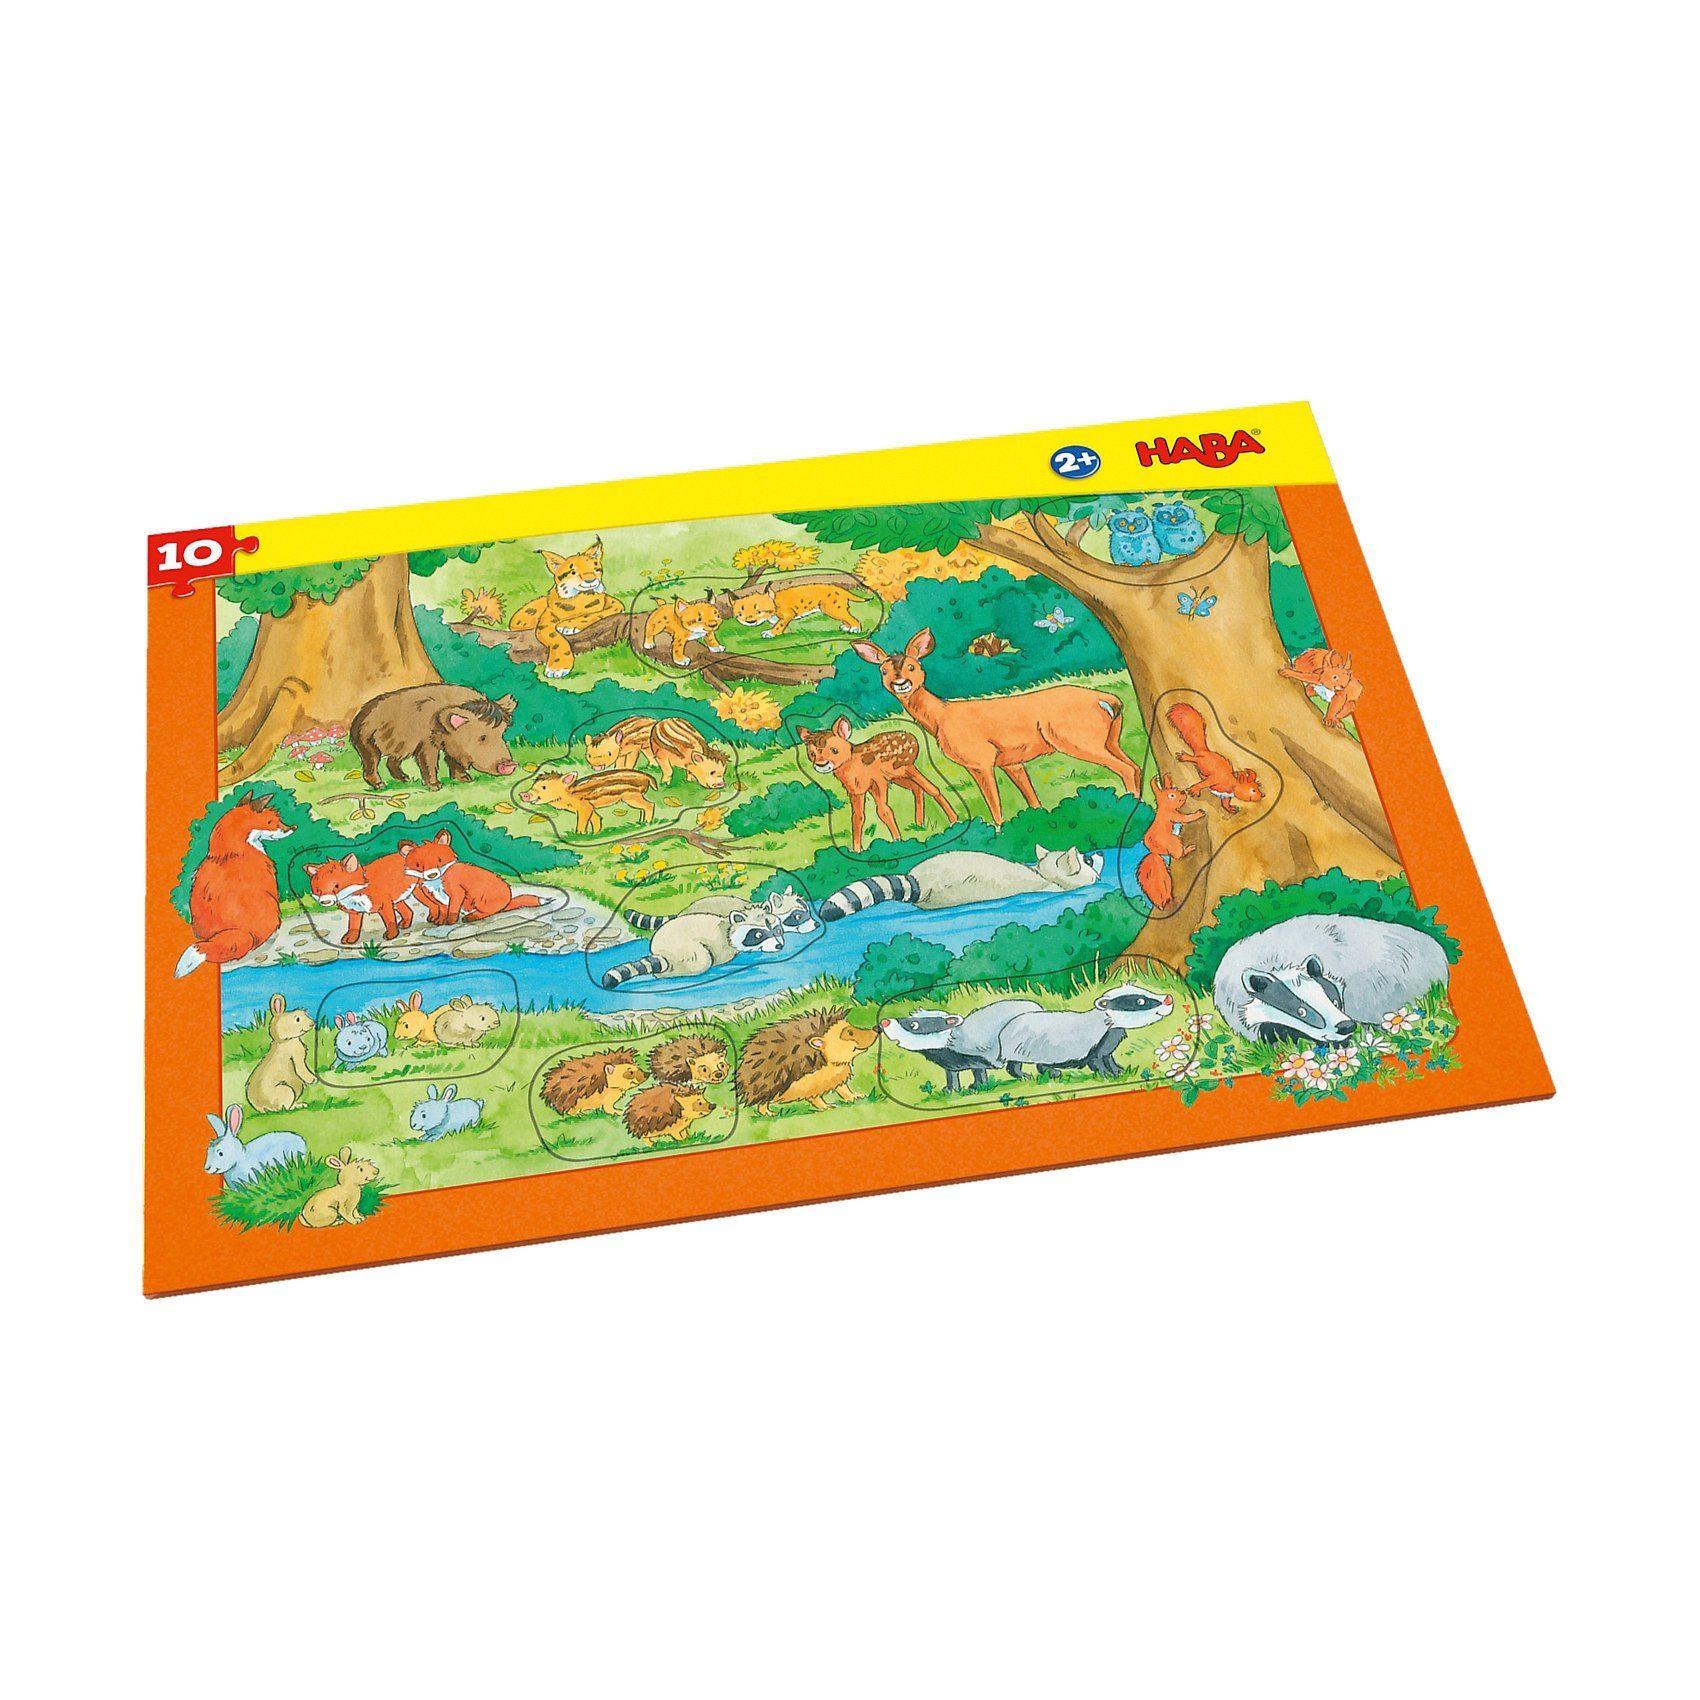 Haba Rahmenpuzzle 10 Teile - Waldtiere